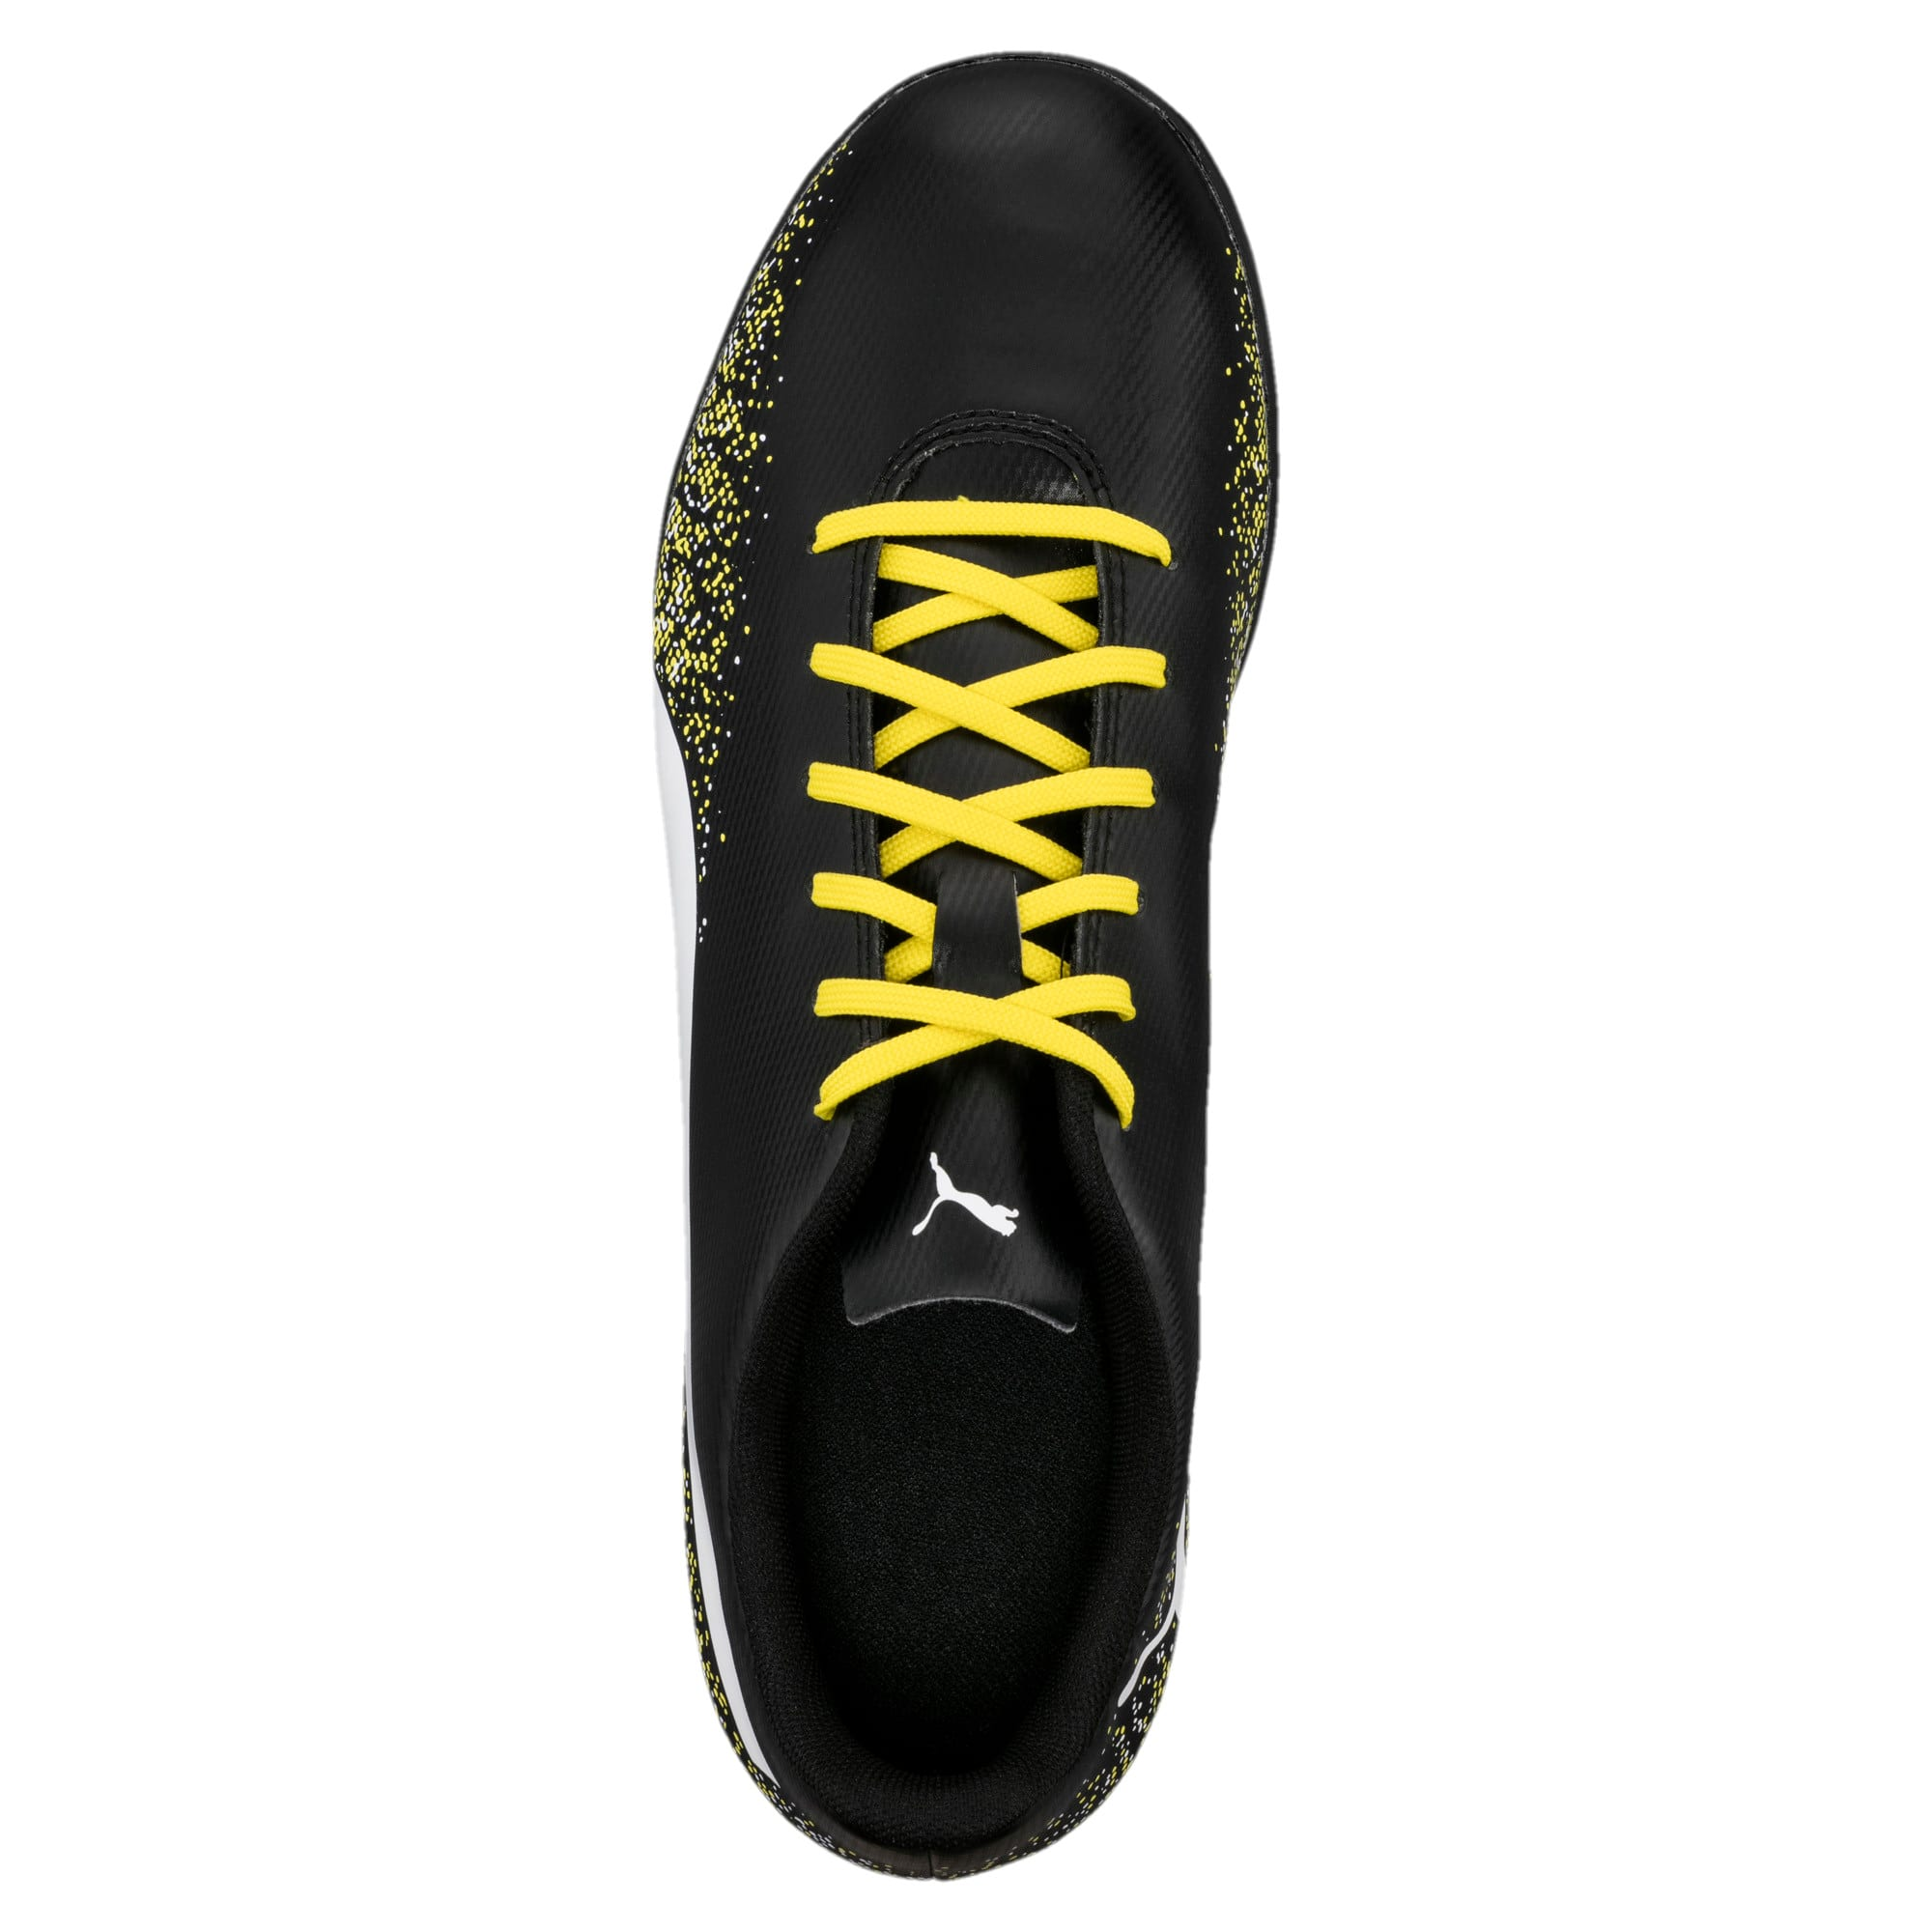 Thumbnail 5 of Truora TT Men's Football Boots, Black-White-Blazing Yellow, medium-IND